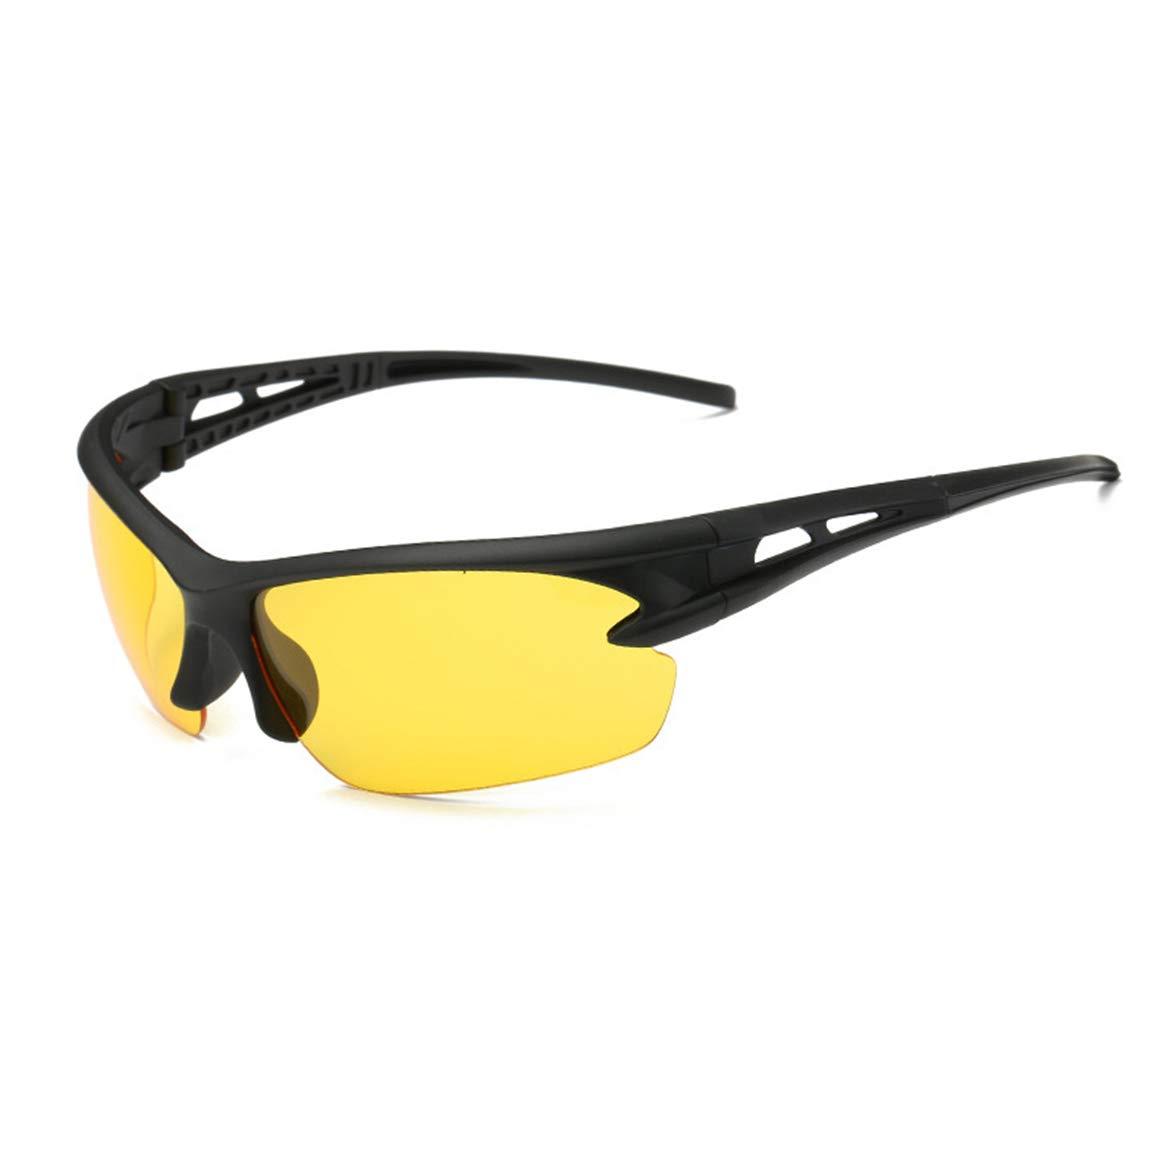 Protecci/ón UV400 Polarizada Deportes Gafas de Sol Ciclismo para Hombres Mujeres Ultralight Conducci/ón Anti-Reflexivo TR90 Gafas